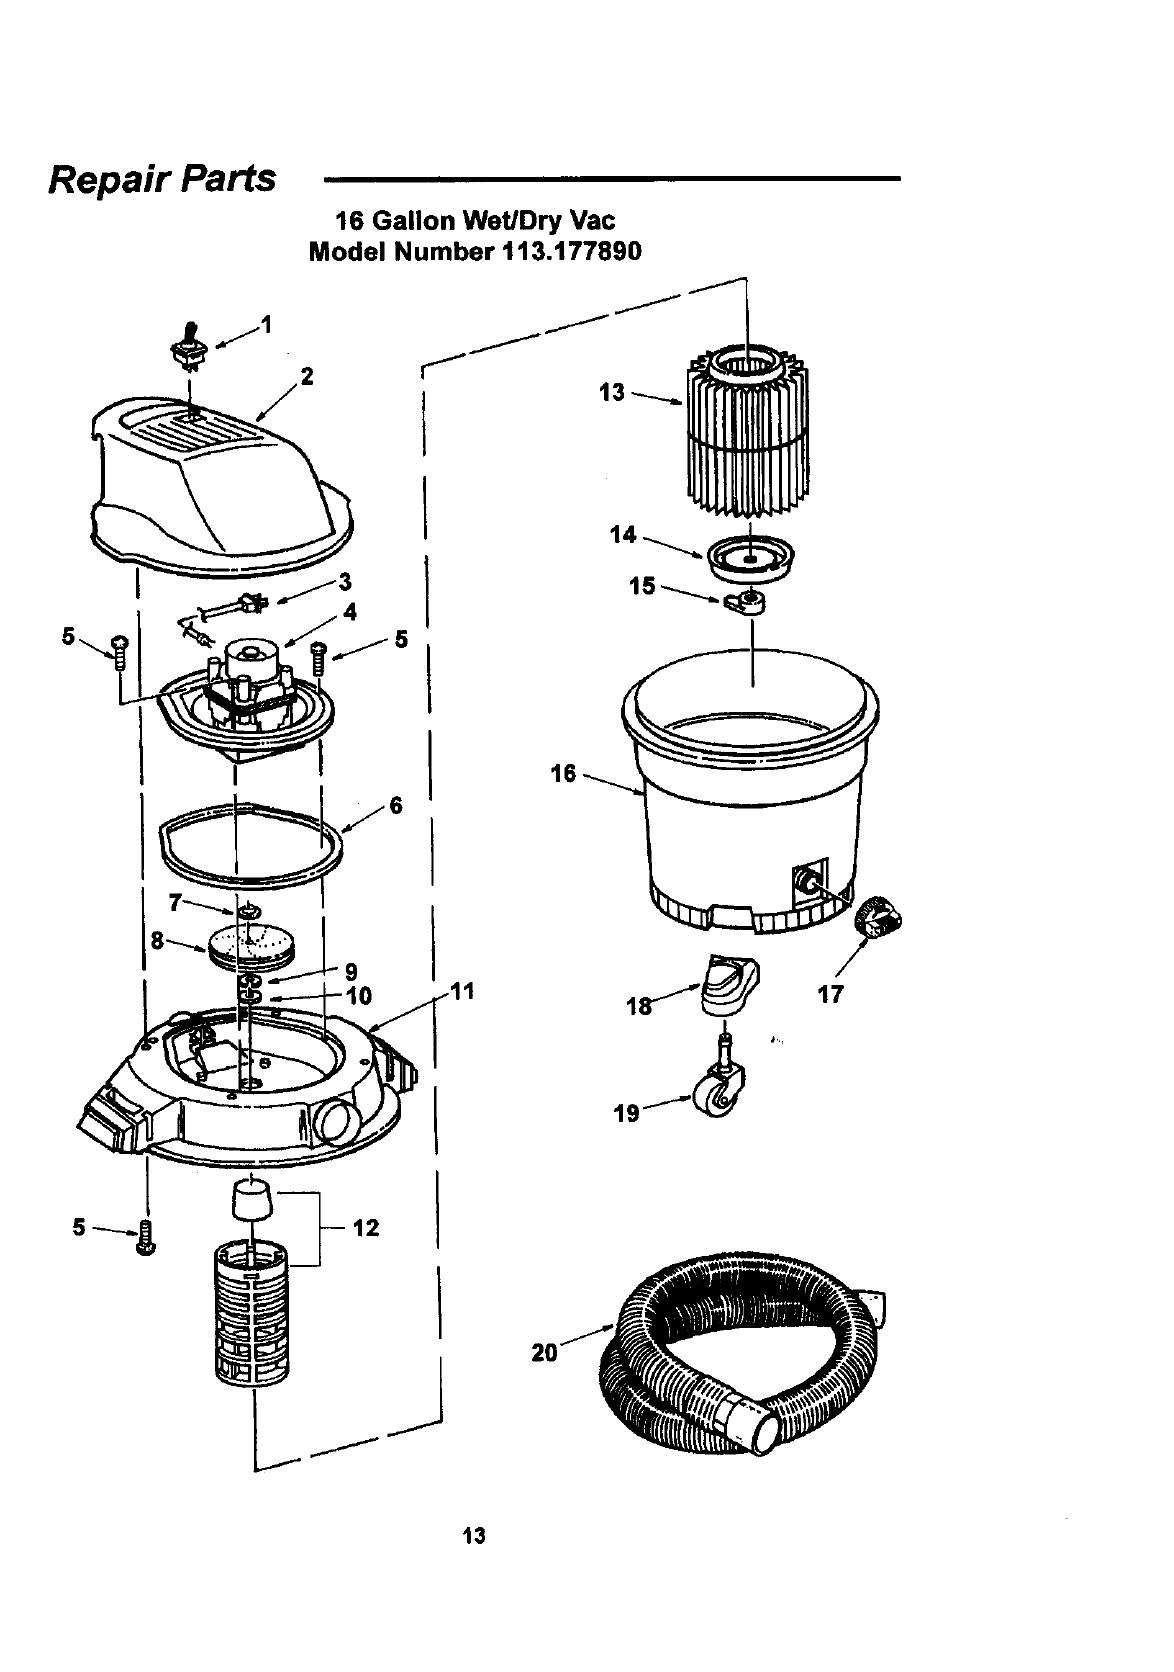 Craftsman 113177890 User Manual 16 GALLON FULL BLOWING WET